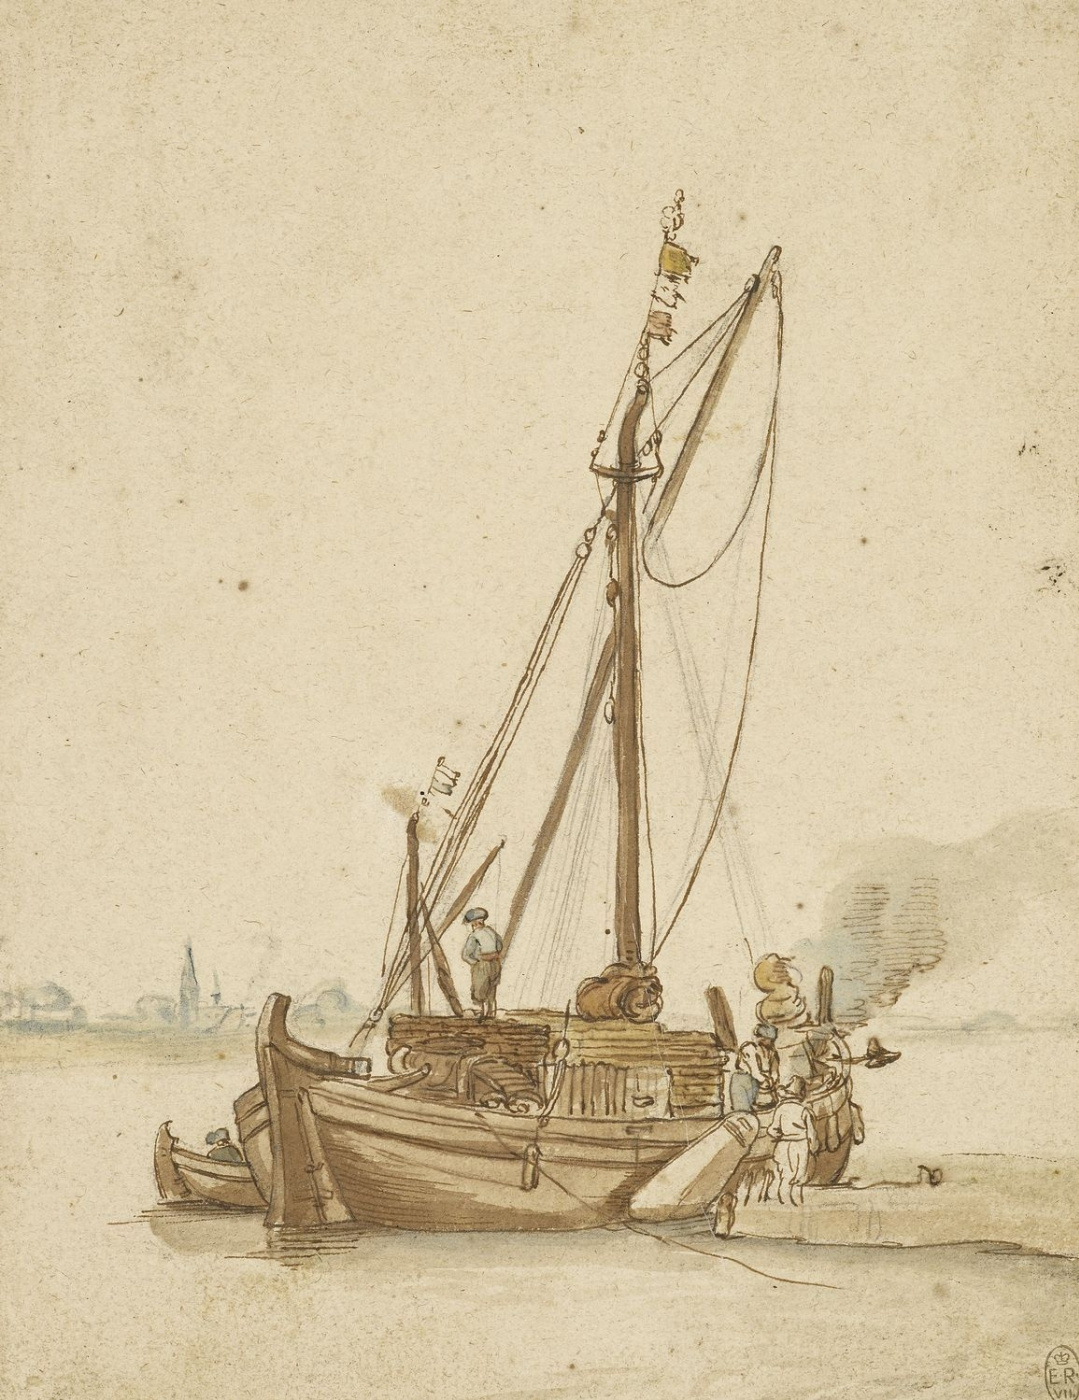 Hendrik Avercamp. Sailing barge, moored on the river